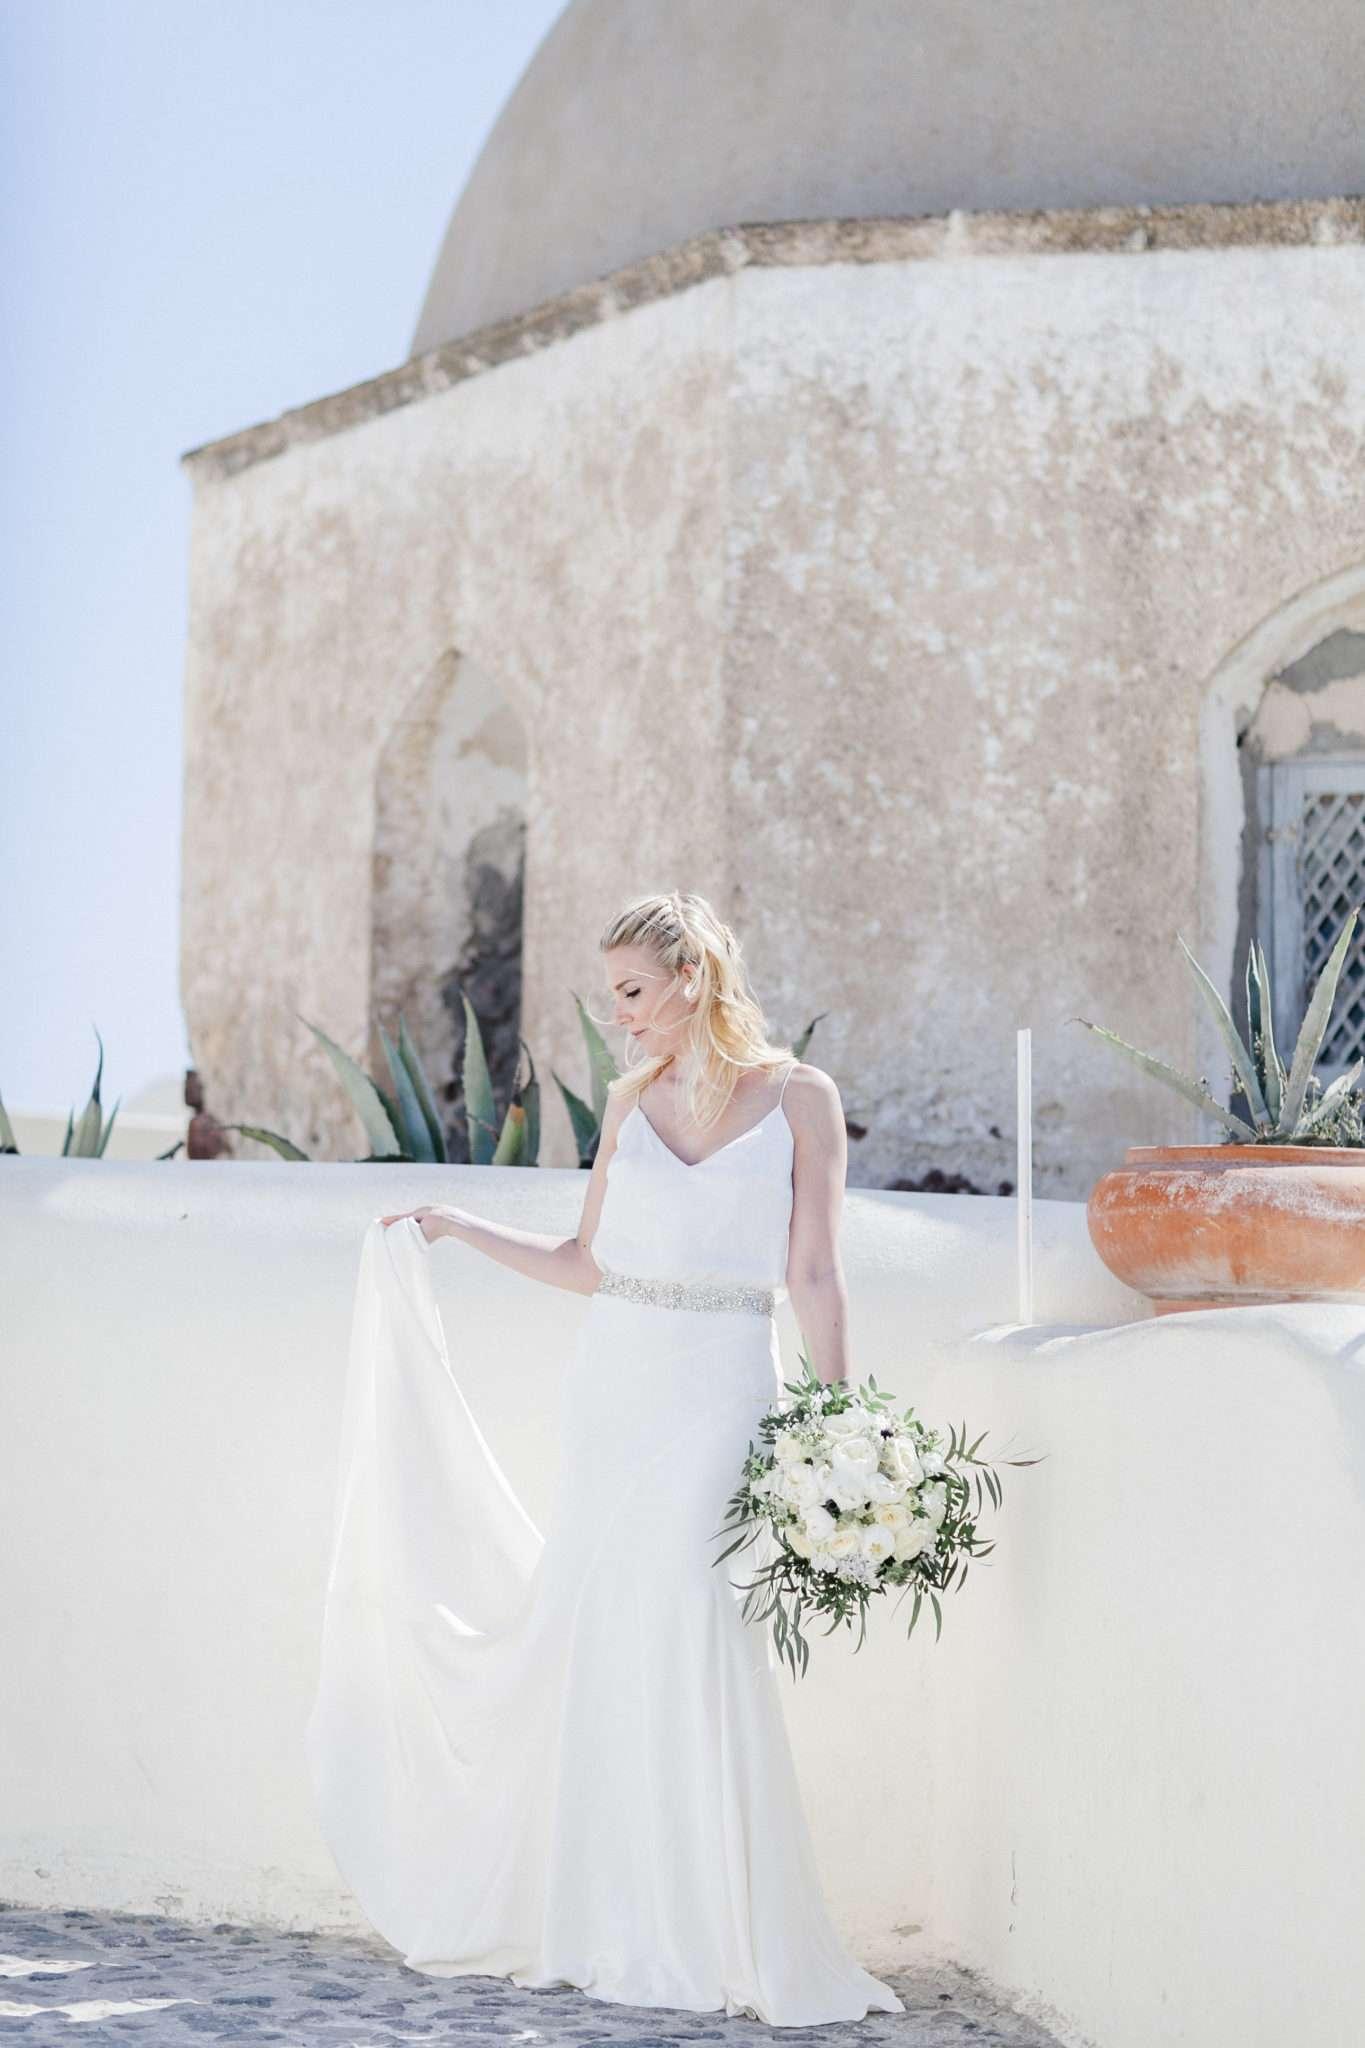 bride with long white wedding gown, wedding dress, summer wedding dress, bridal bouquet